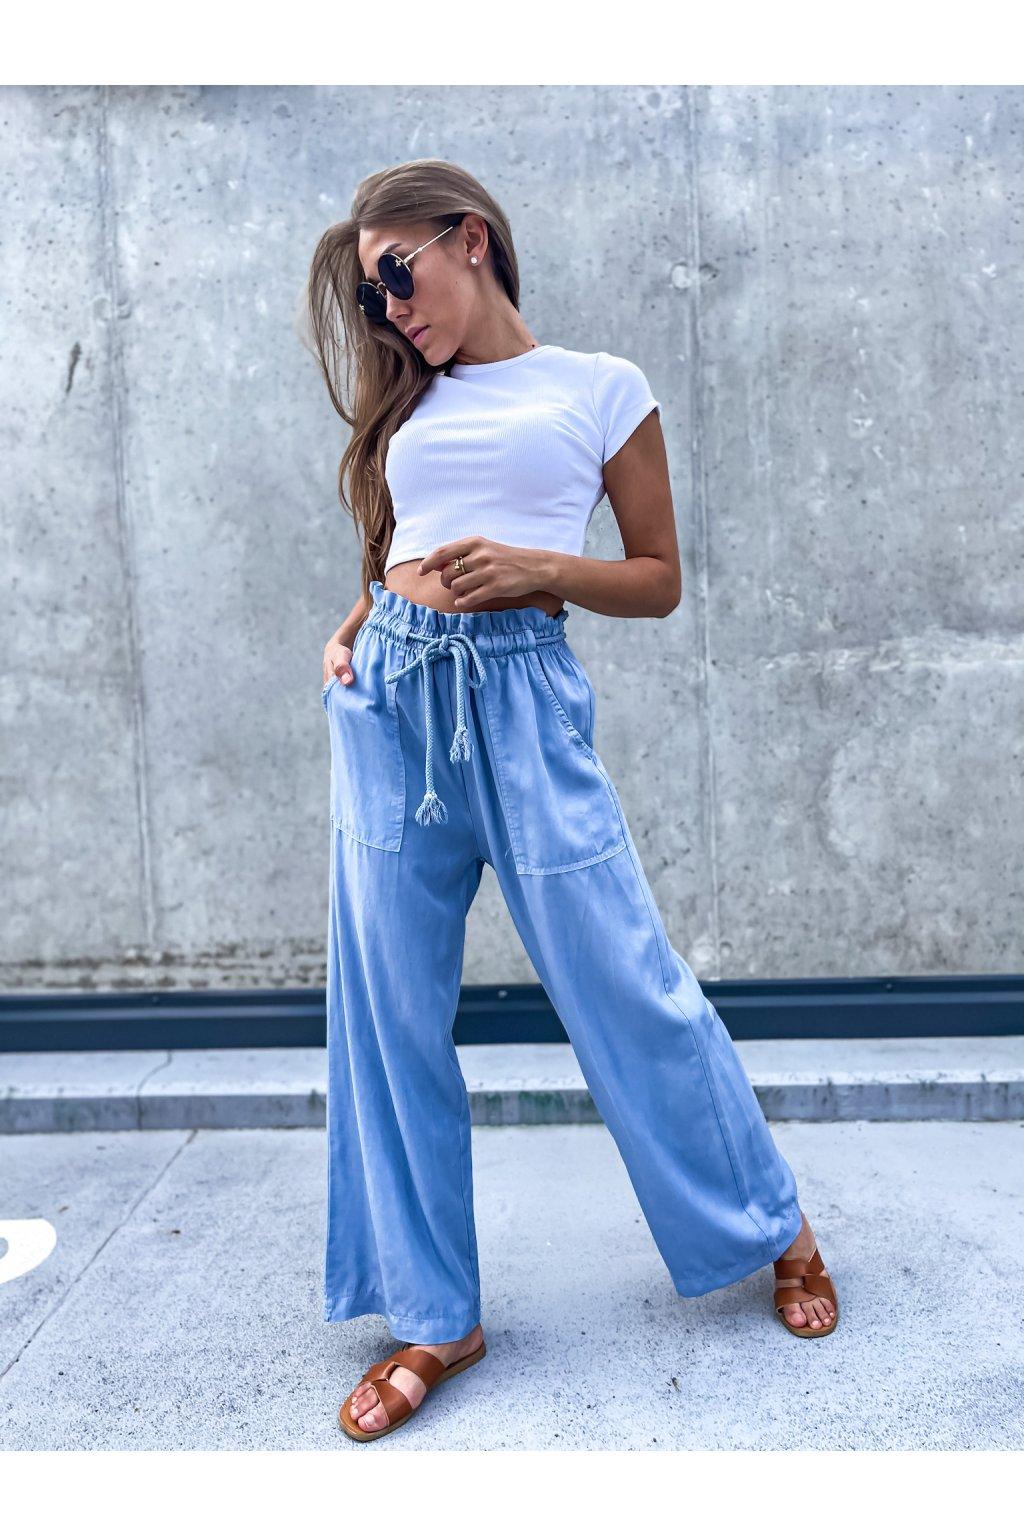 damske kalhoty cannes blue eshopat cz 1